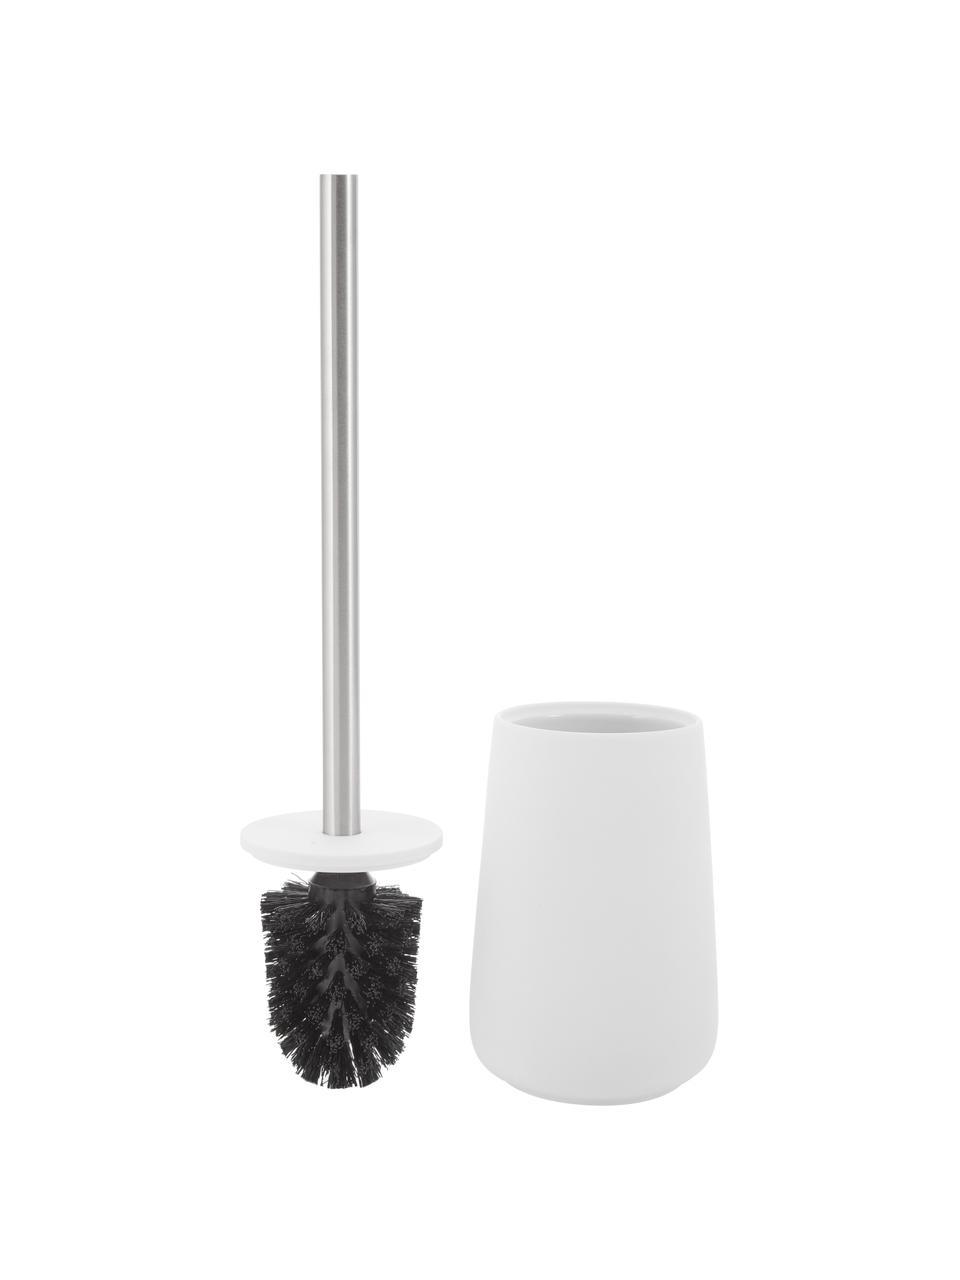 Toiletborstel Brush, Houder: porselein, Mat wit, edelstaalkleurig, Ø 10 x H 43 cm